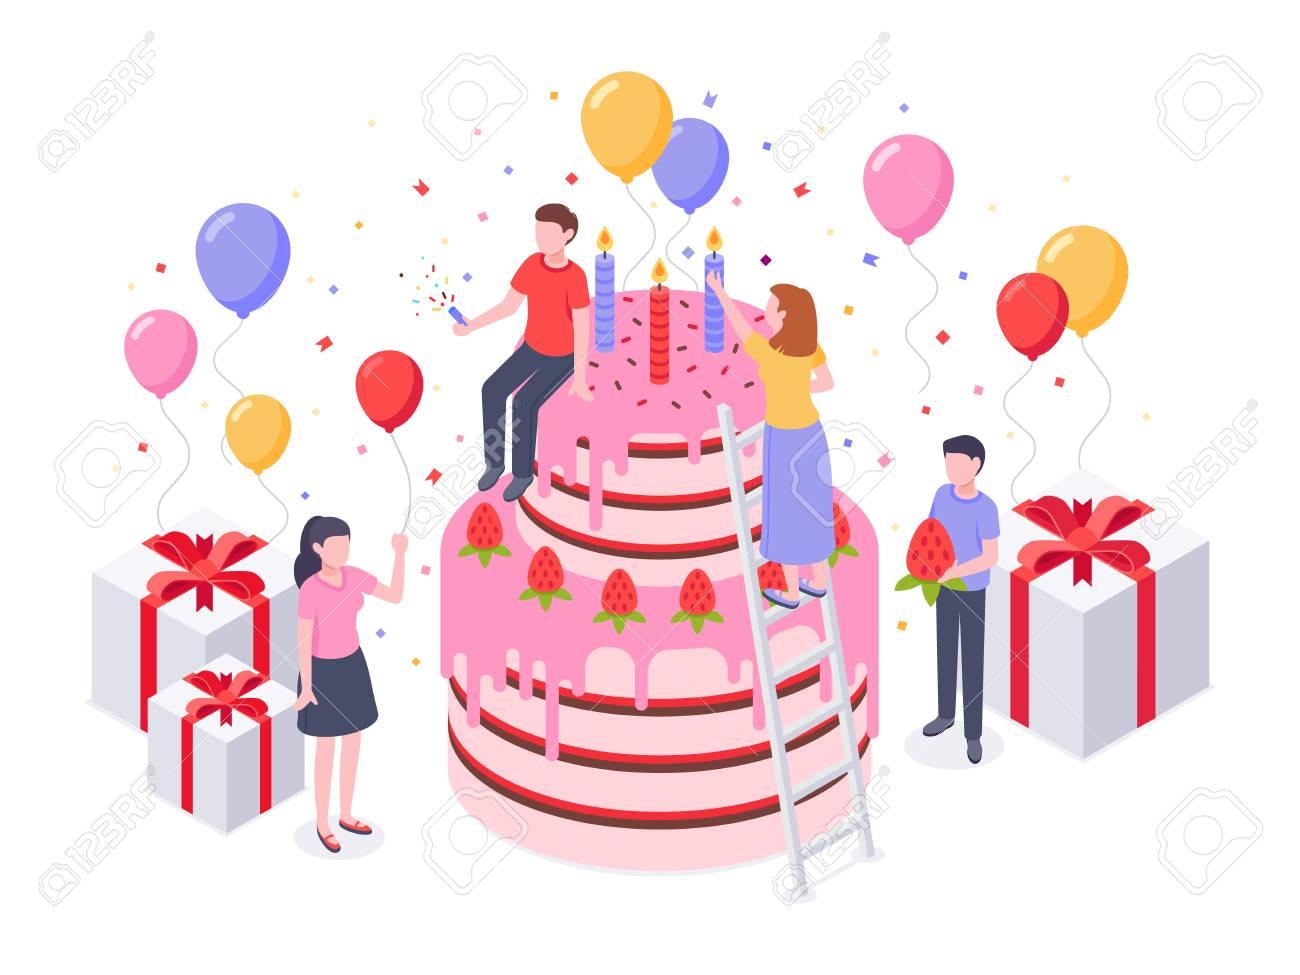 Swell Isometric Birthday Cake Party Confetti Cakes Present And Funny Birthday Cards Online Benoljebrpdamsfinfo